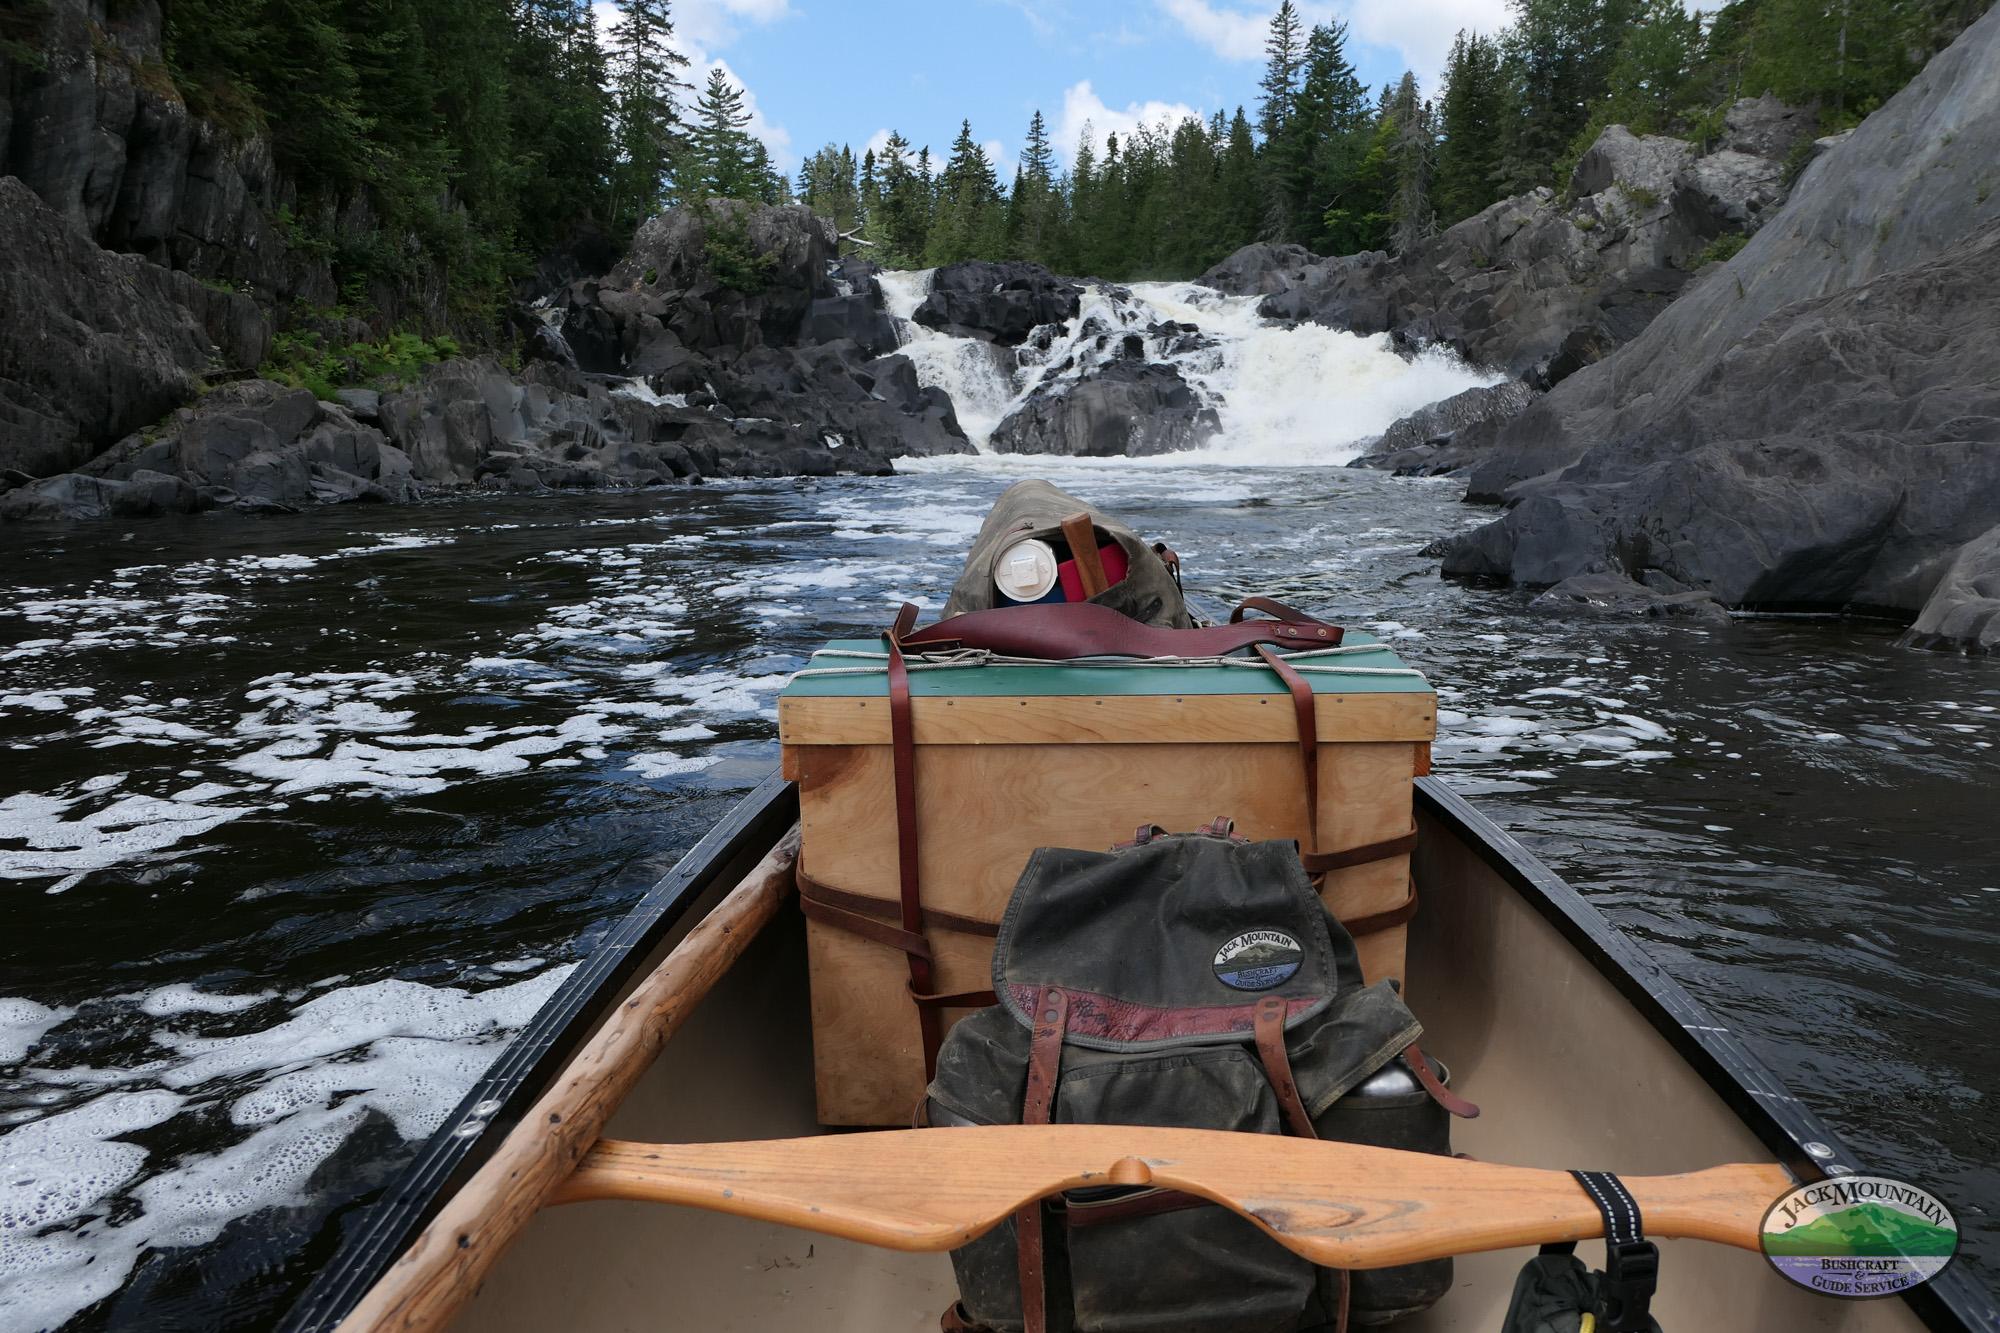 Night 1 Of The Wilderness Canoe Expedition Semester | JMBV 97